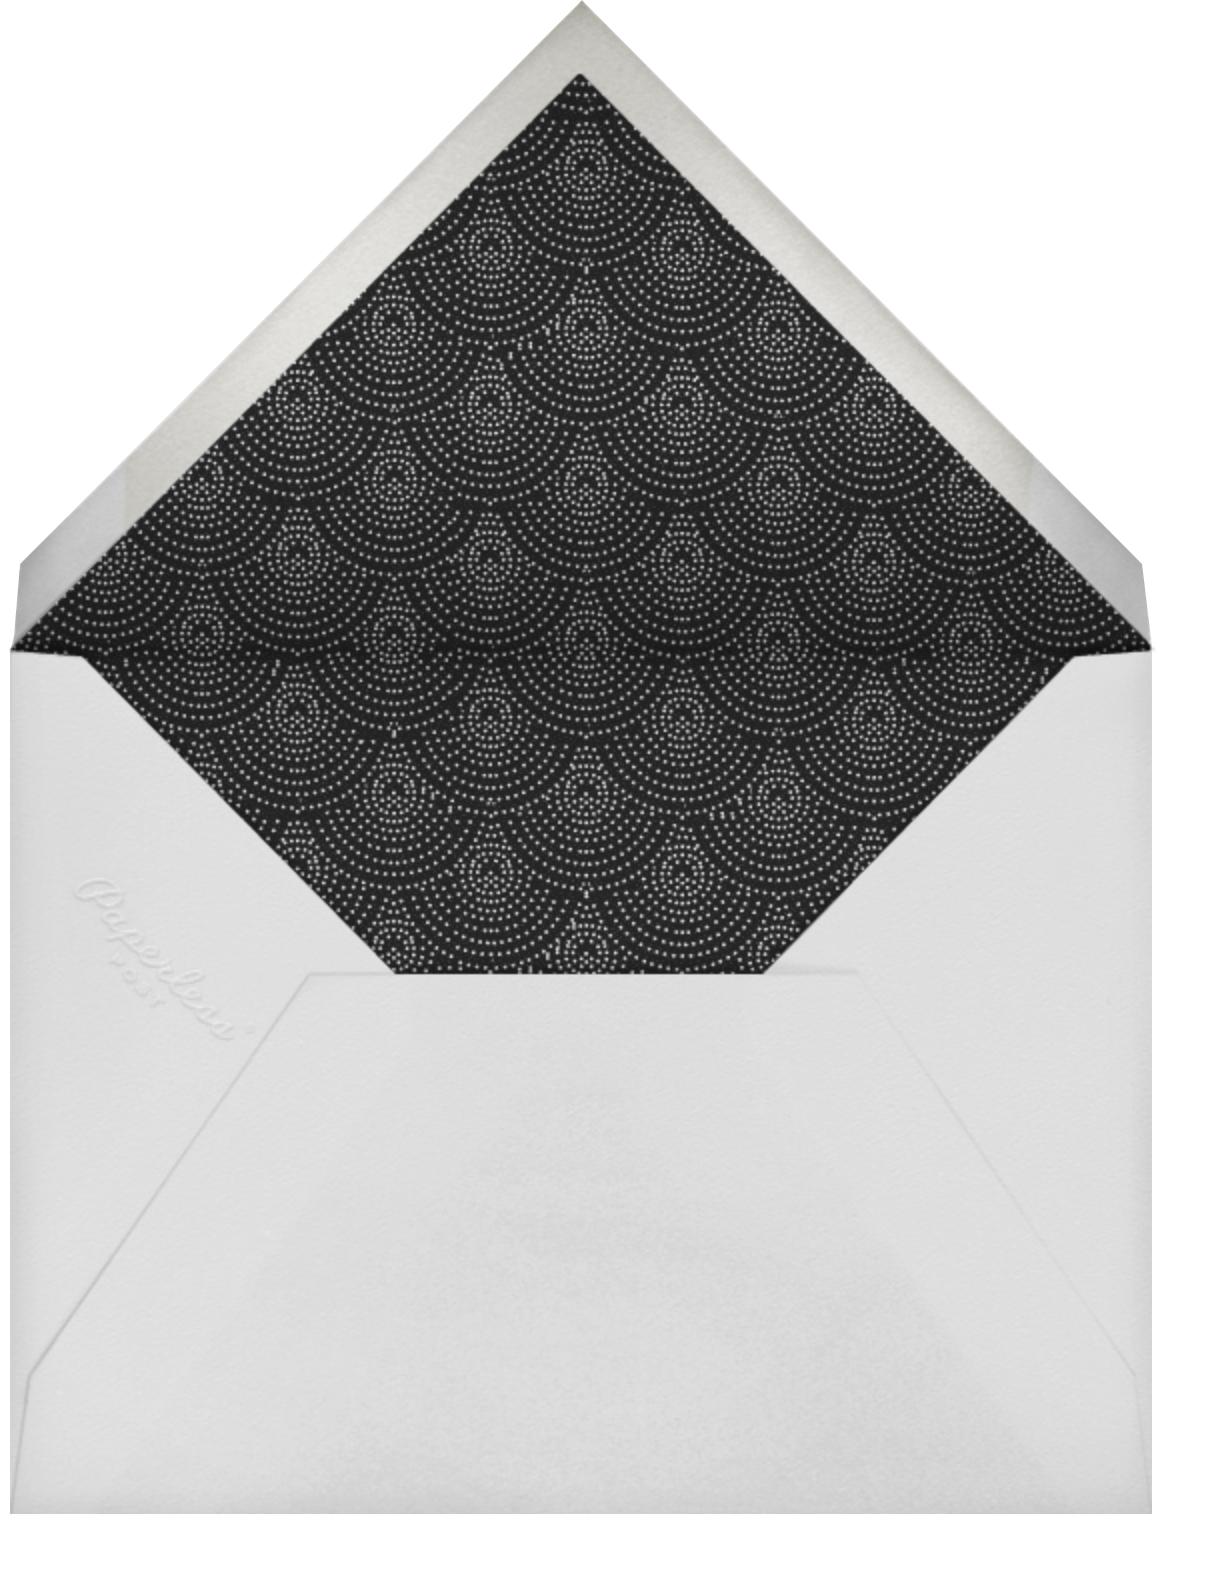 Croc Border - Raspberry - Paperless Post - Adult birthday - envelope back